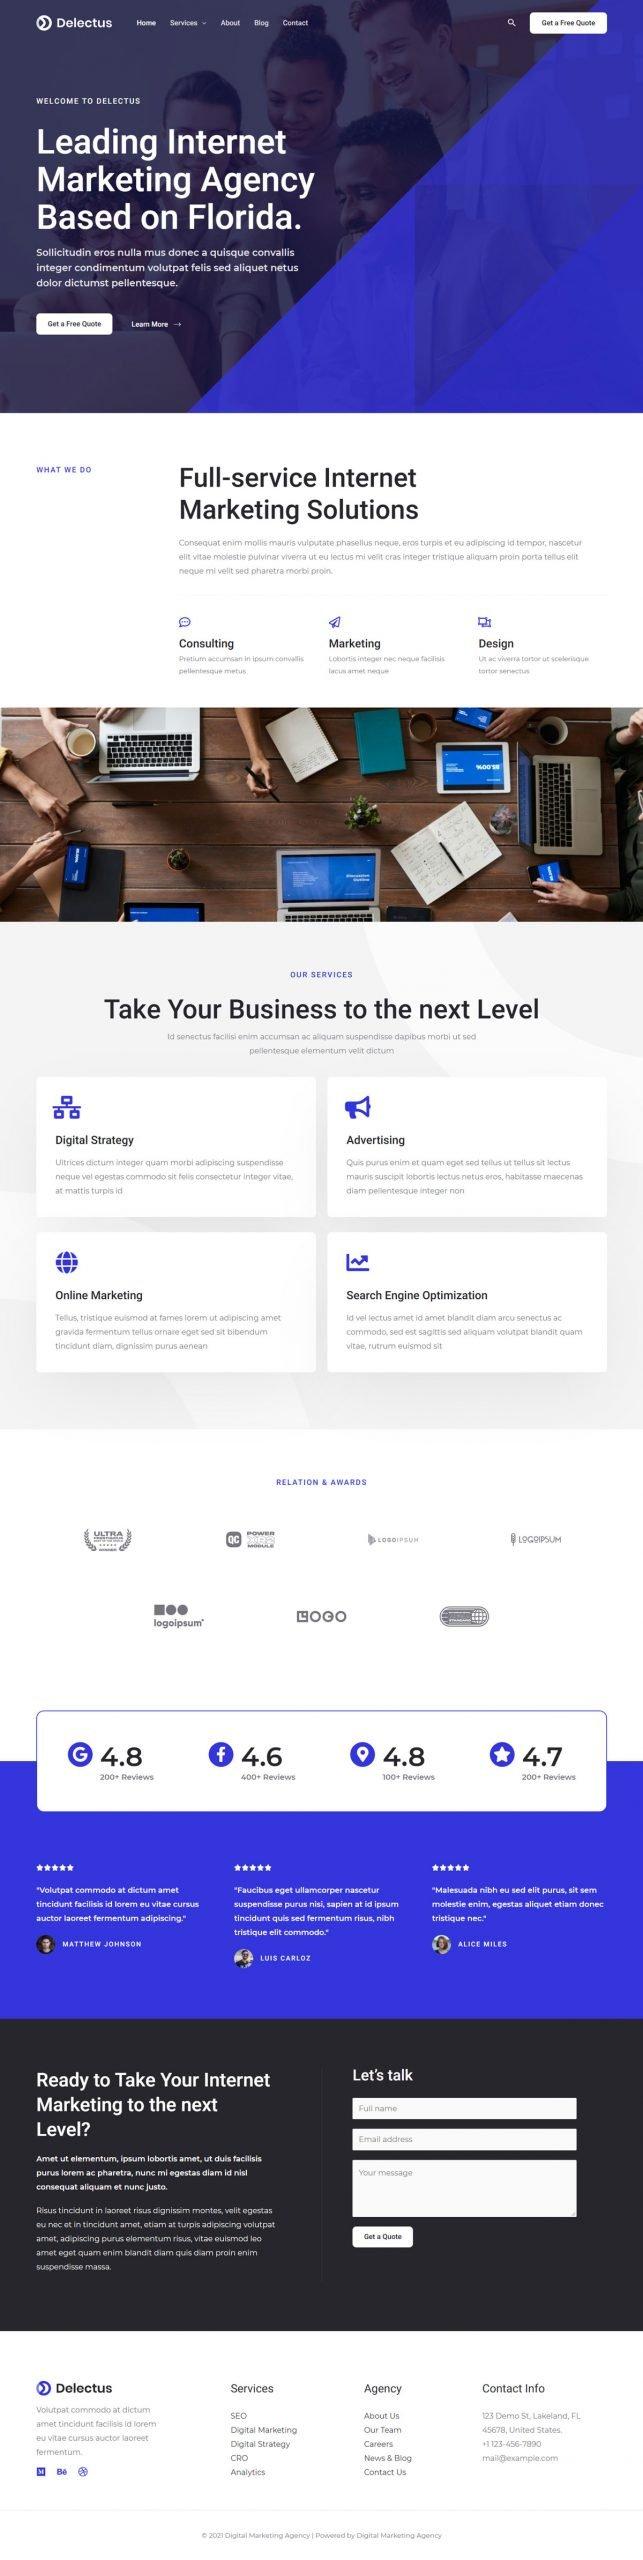 Adamo Web Design | Web Design Durham | digital marketing agency 02 home scaled